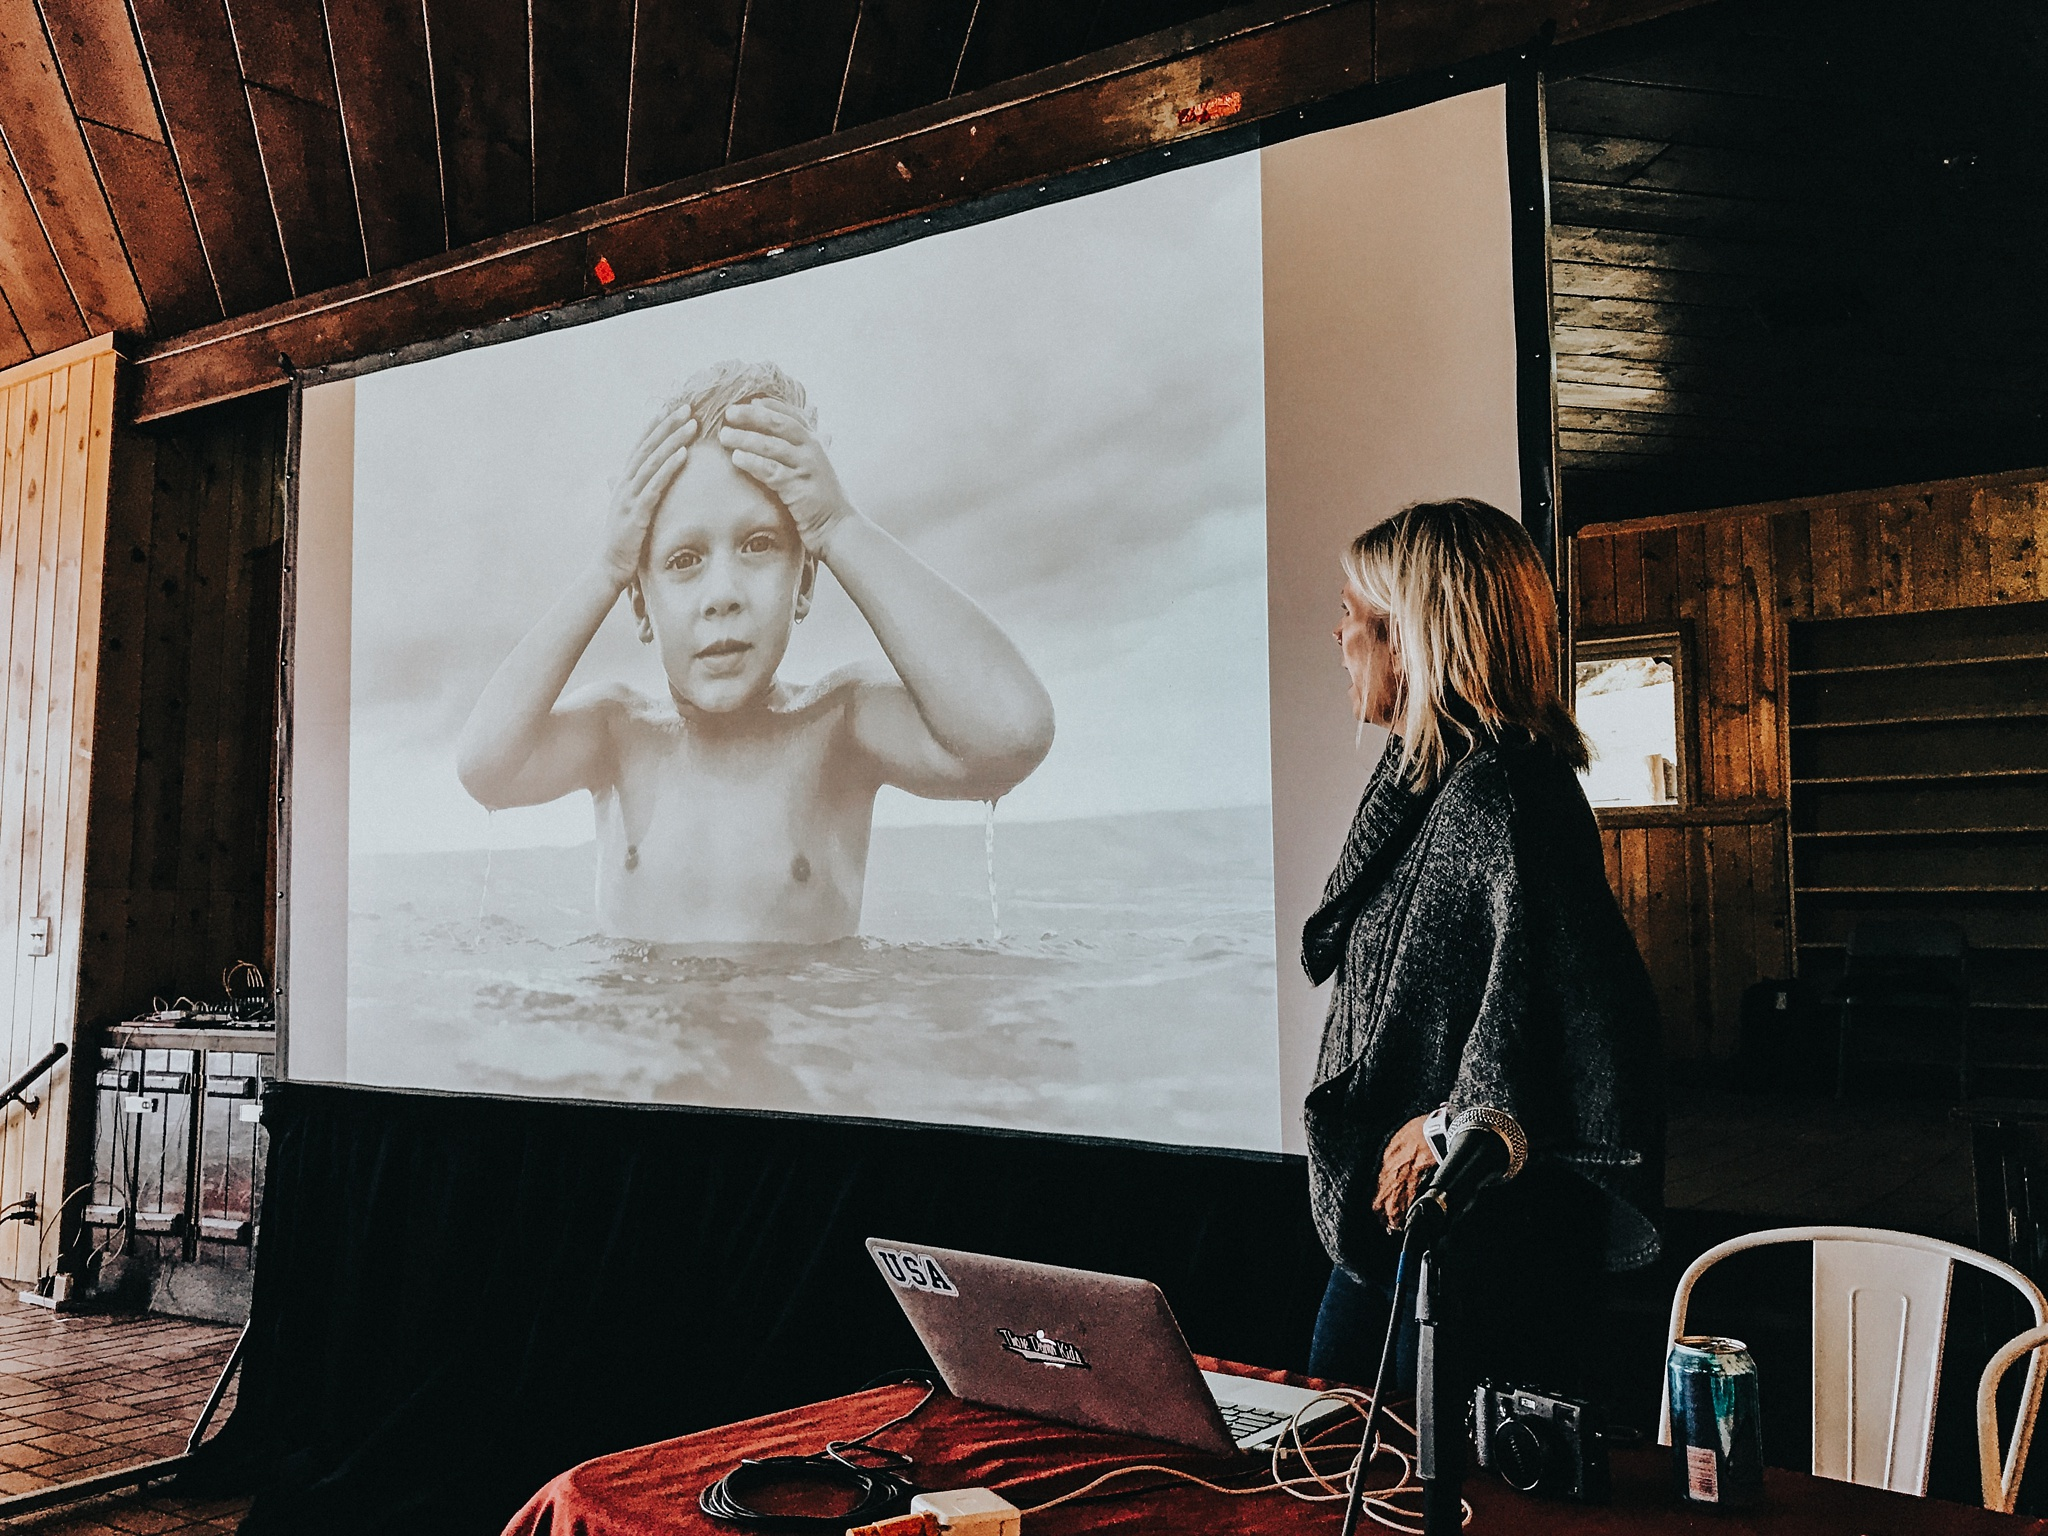 Deb Schwedhelm - her work is so inspiring!